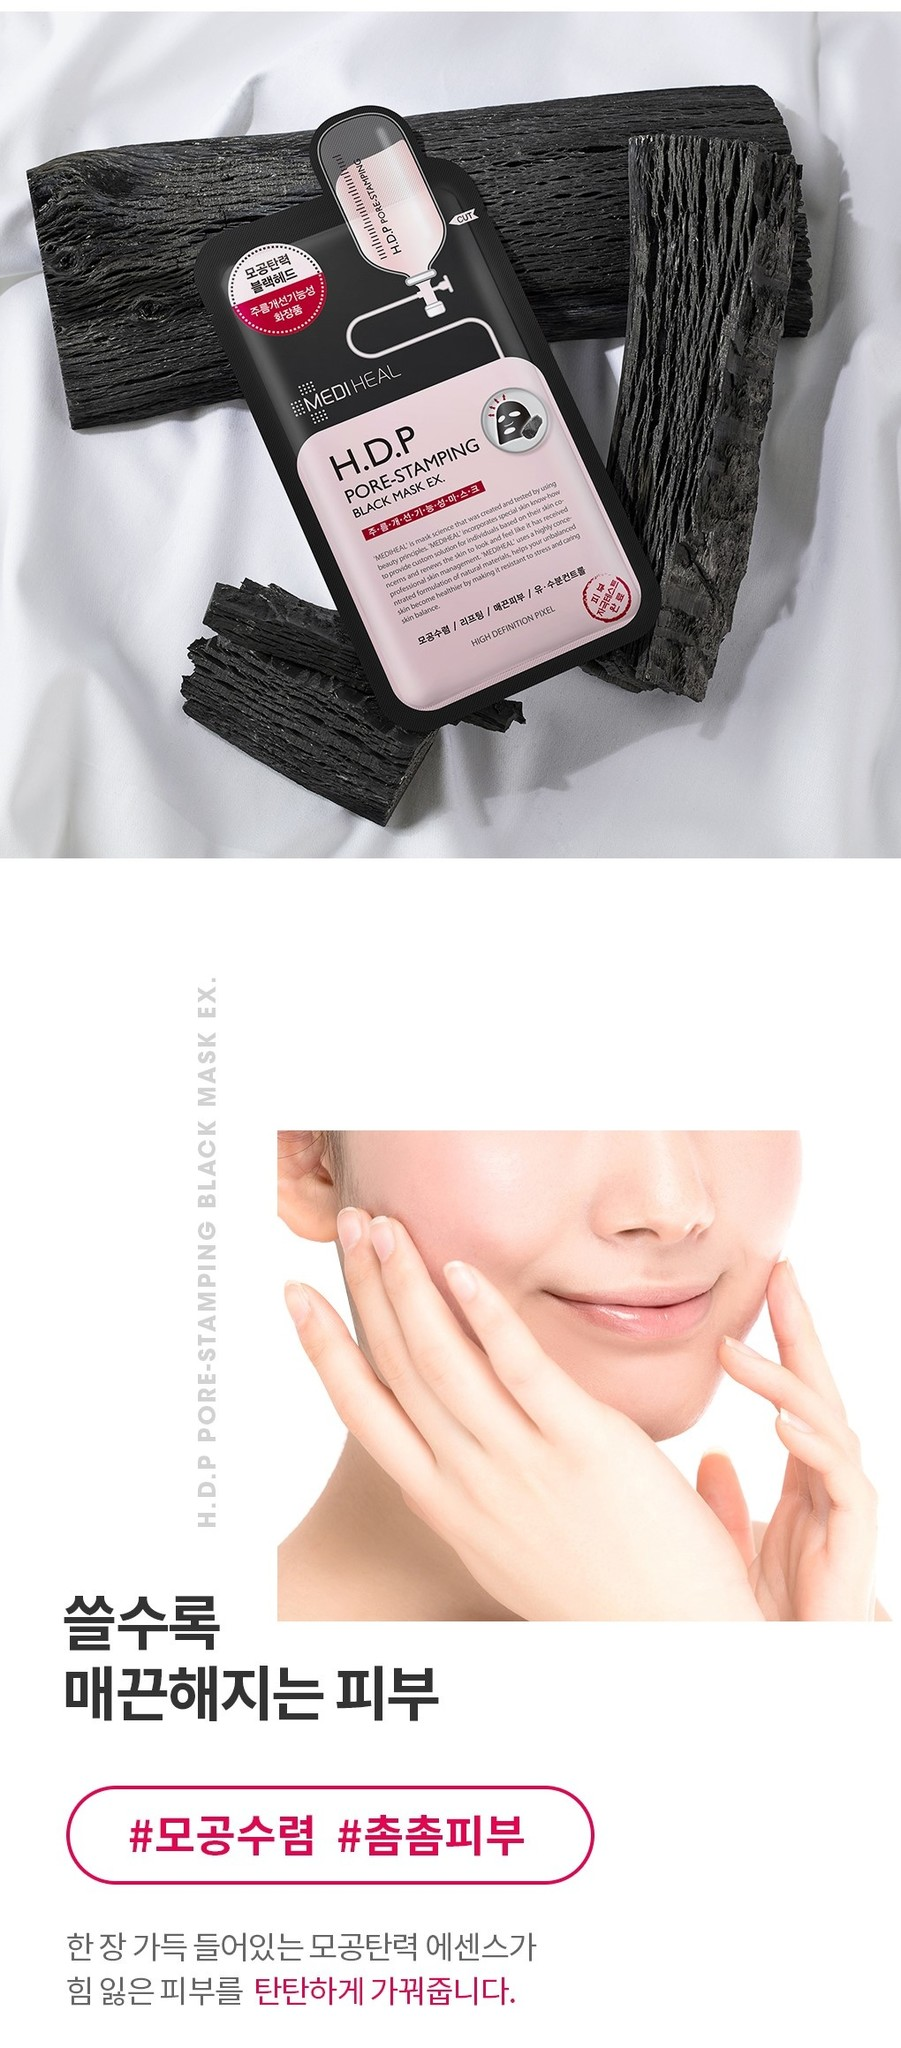 H.D.P Pore-Stamping Black Mask EX.-2